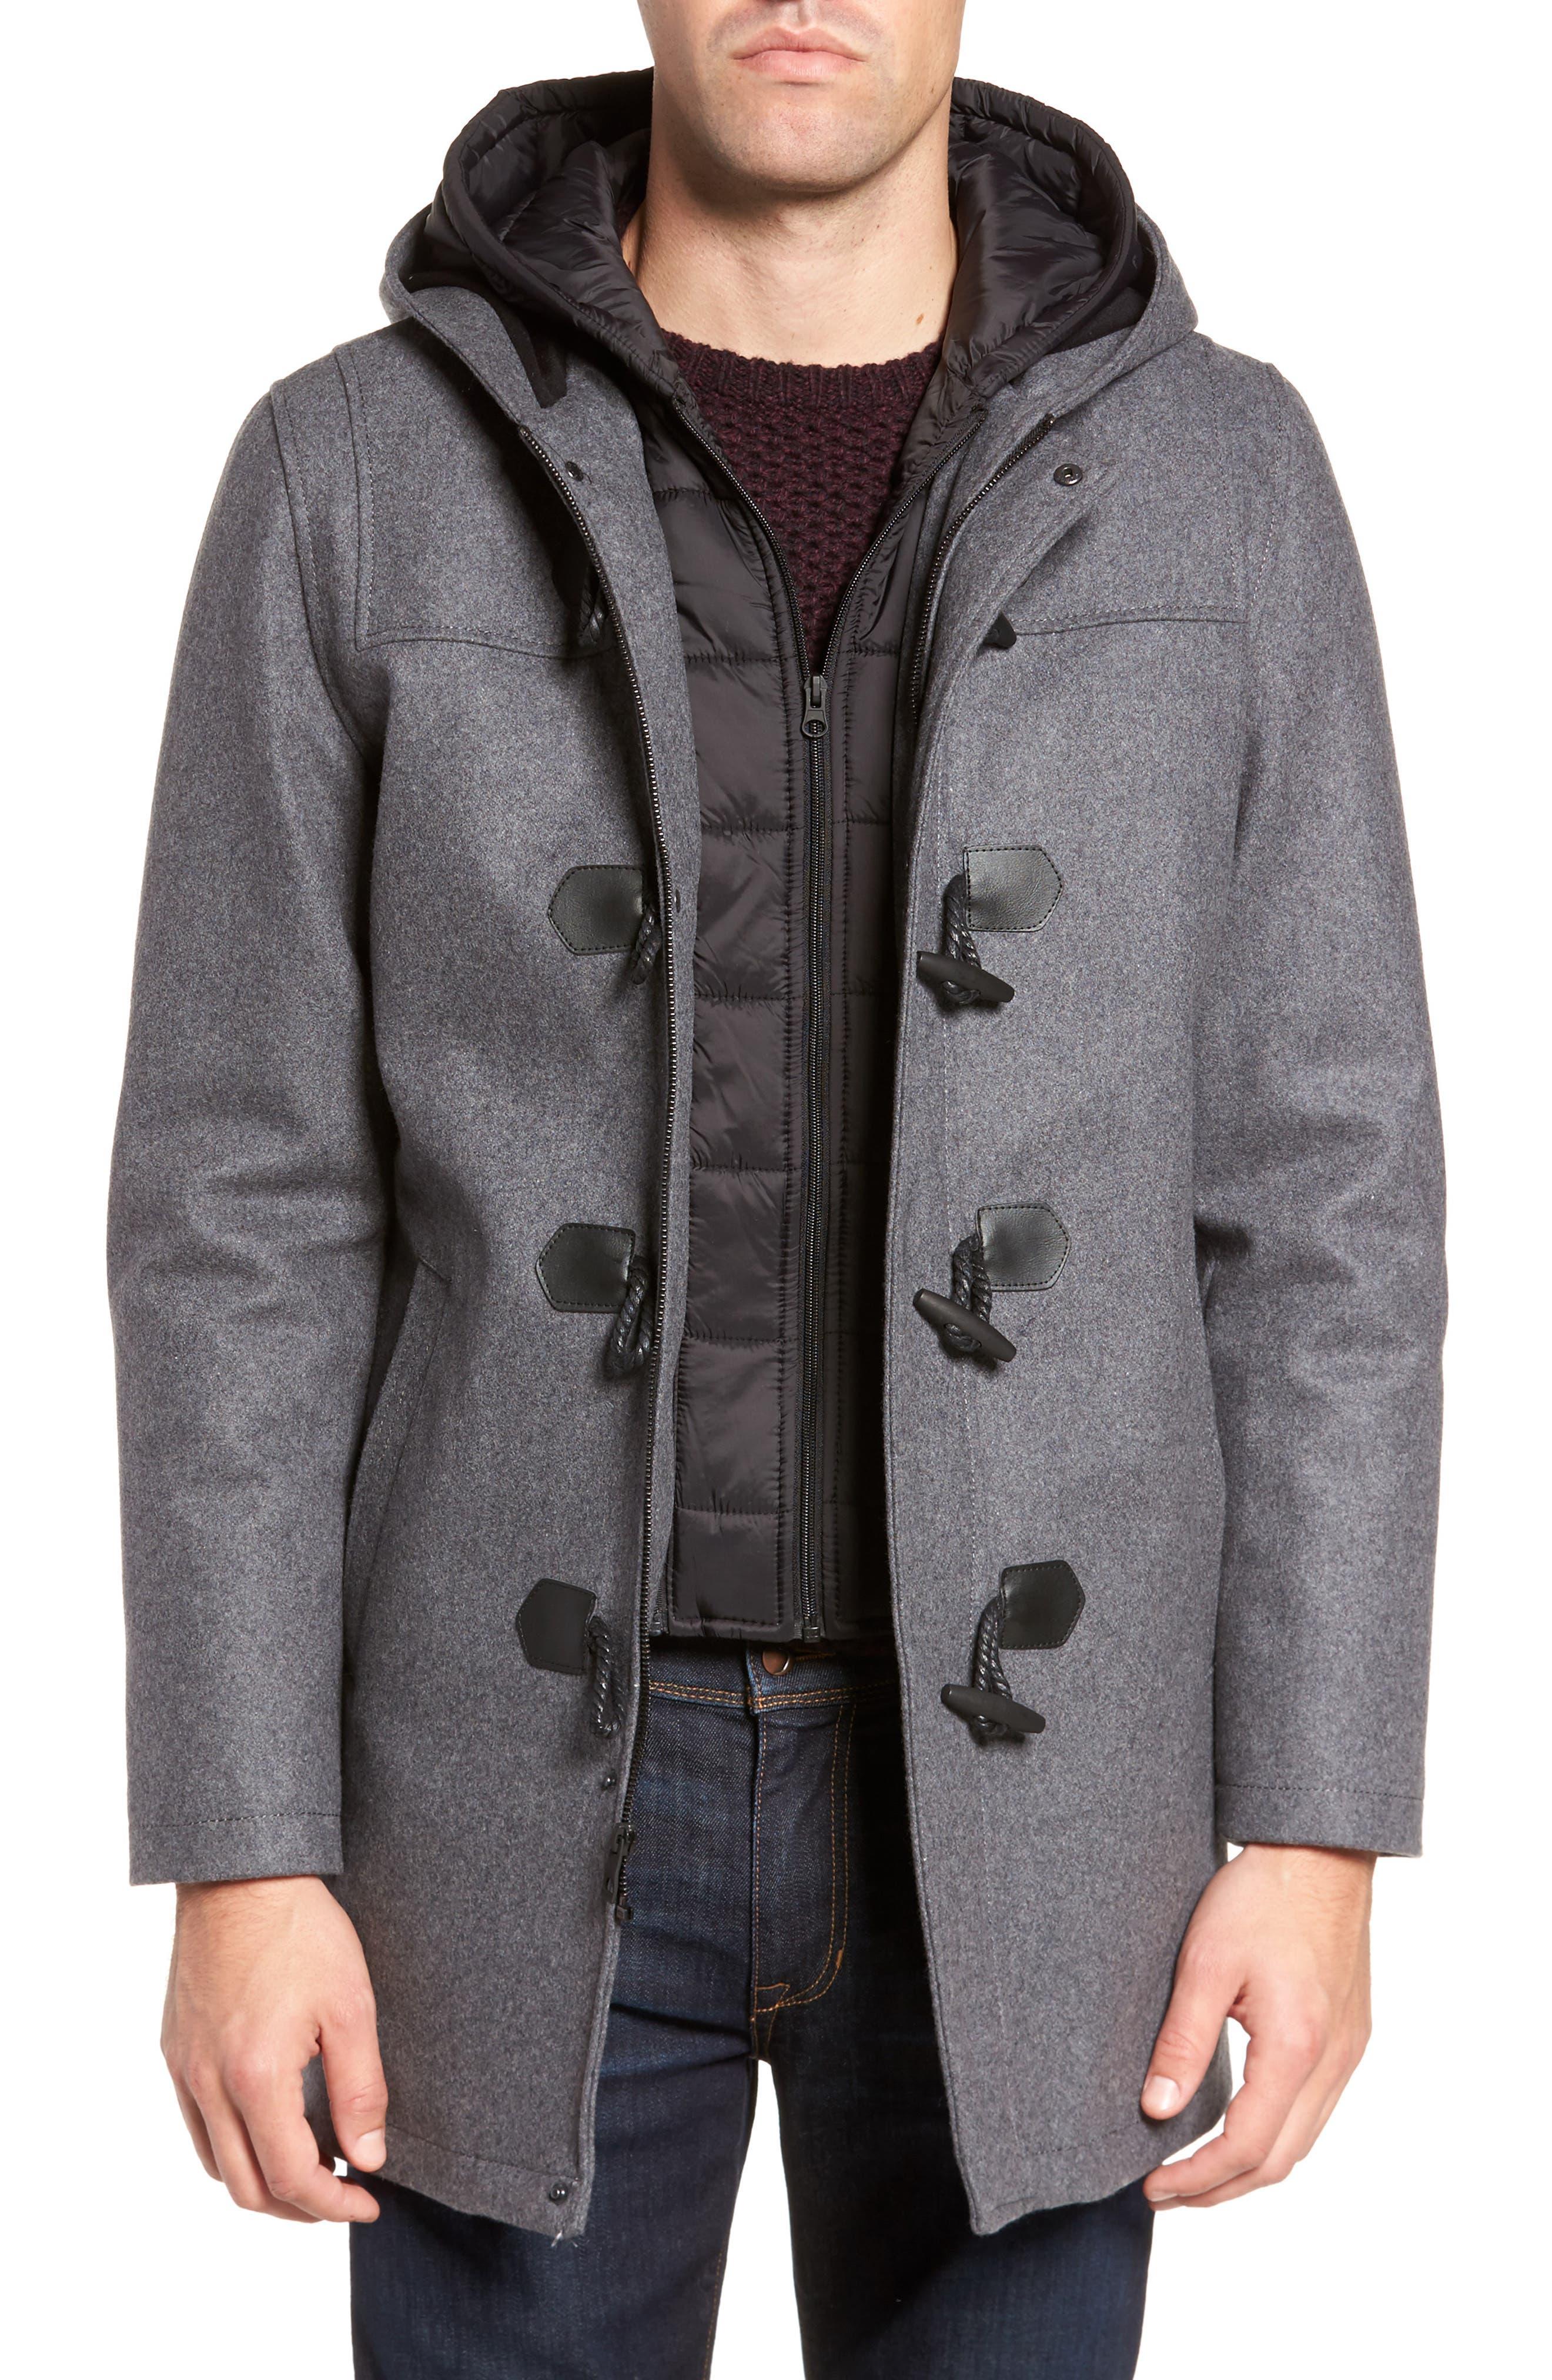 Black Rivet Wool Blend Hooded Duffle Coat